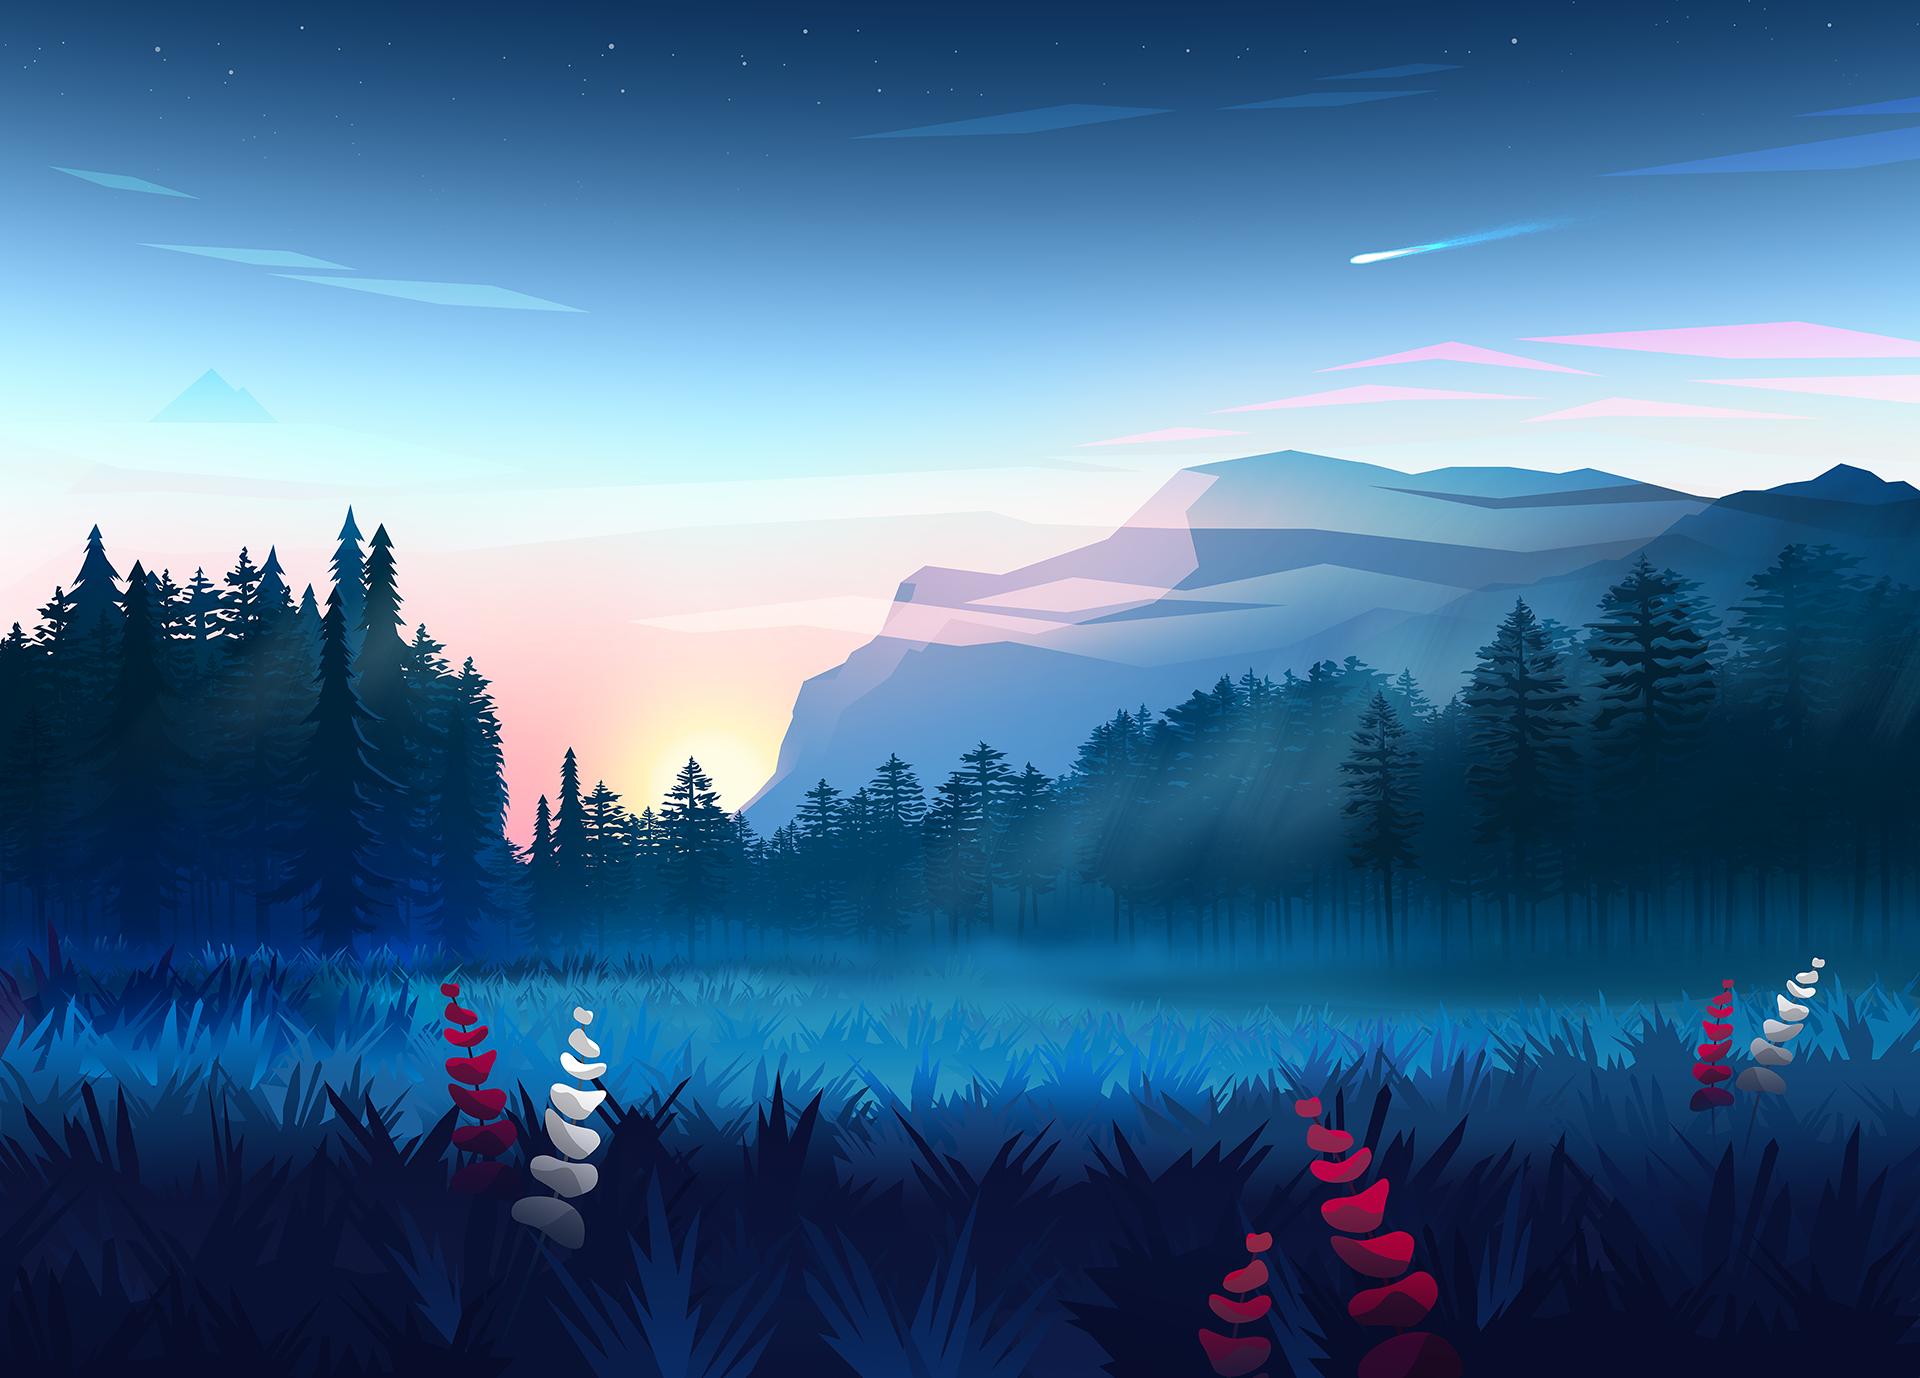 General 1920x1378 nature byrotek  fantasy art colorful trees wood mountains forest digital art sunset blue